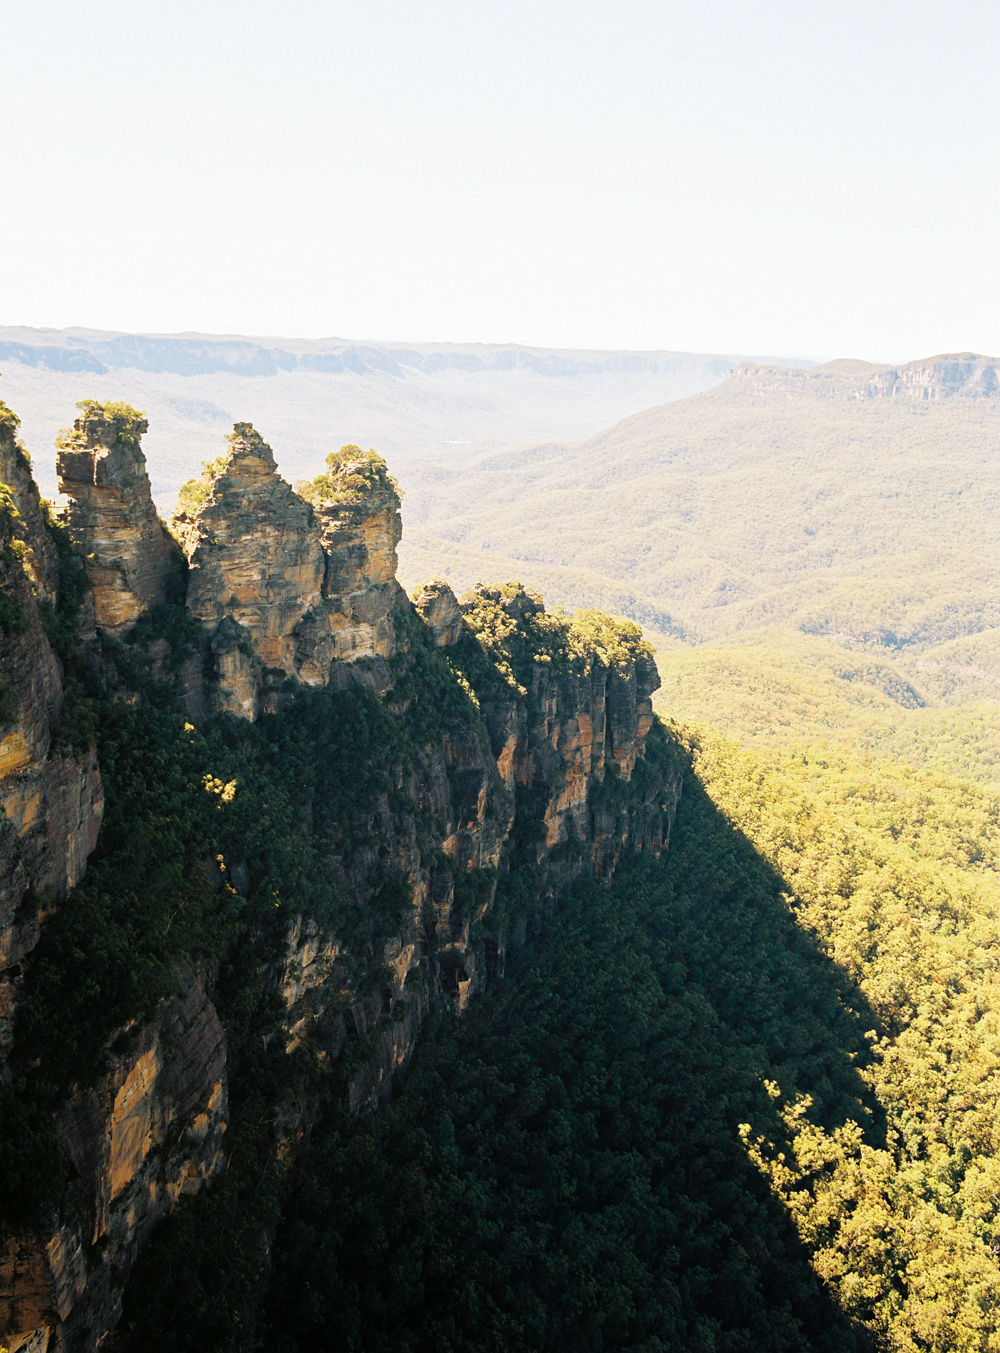 celine_chhuon_photography_blue_mountains_australia_sydney03.jpg